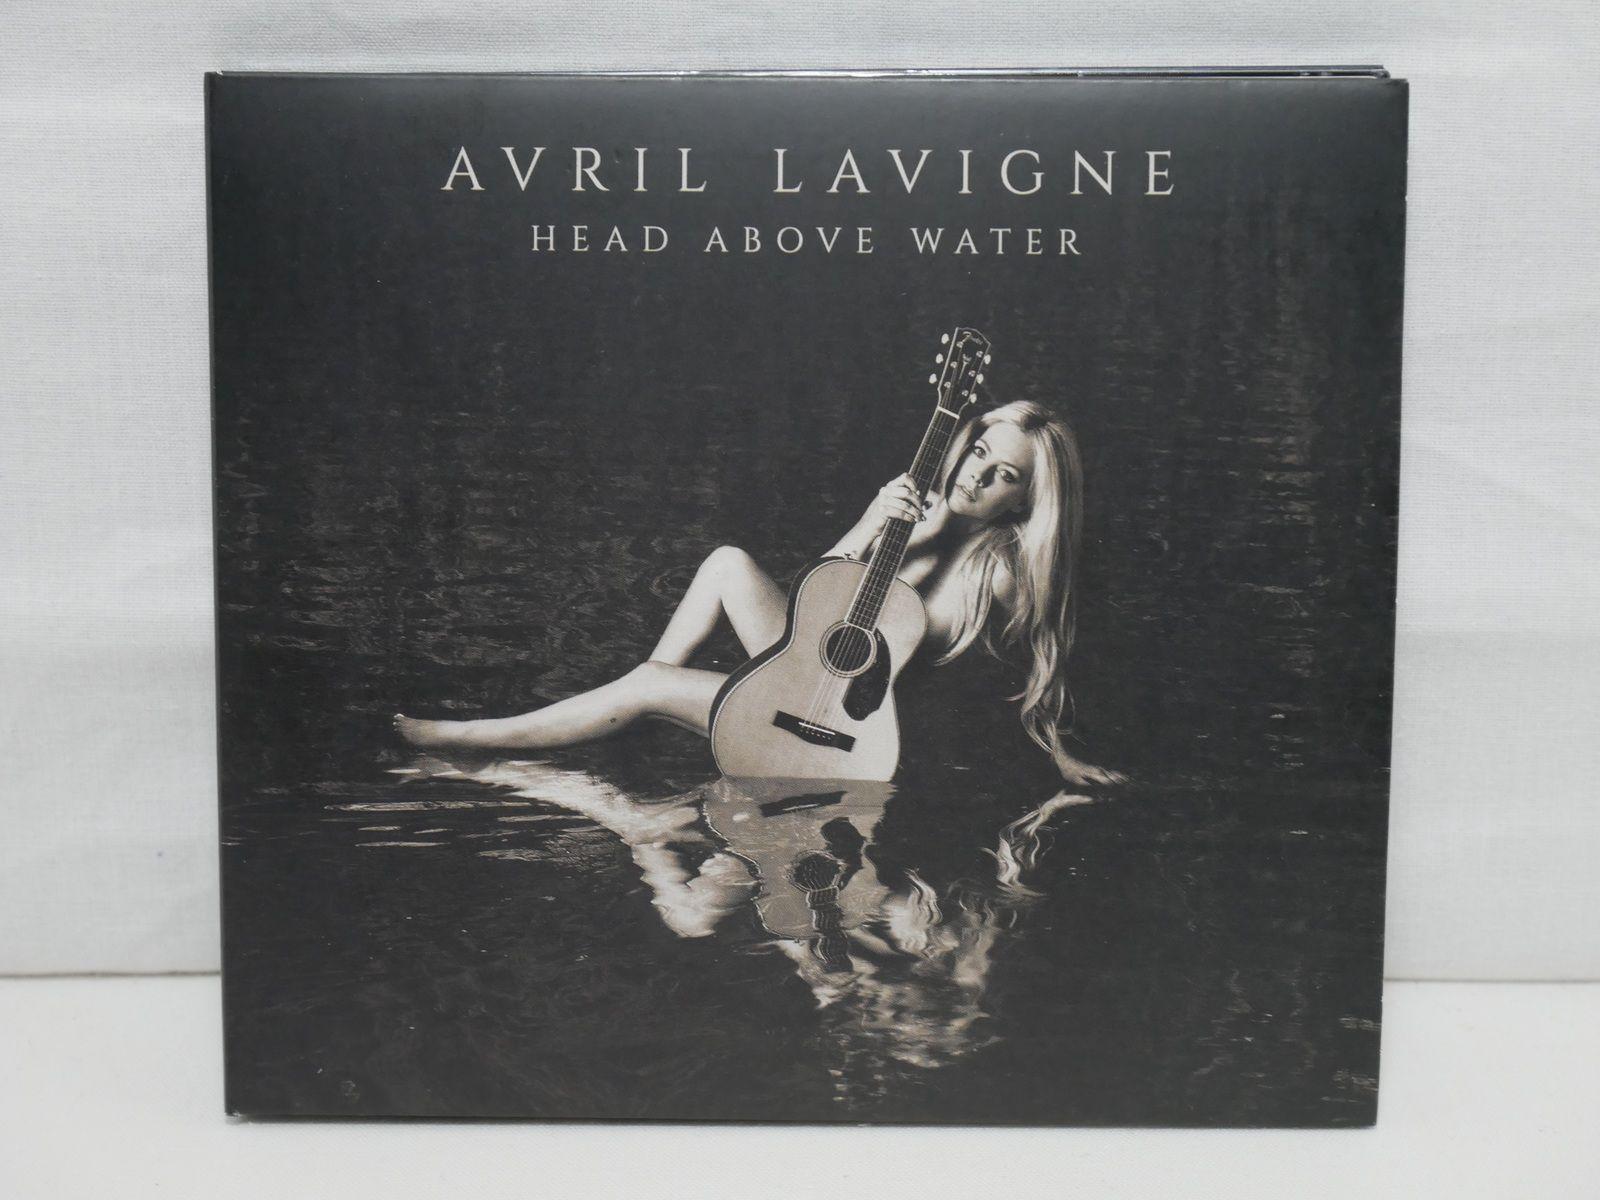 Head above water – Avril Lavigne